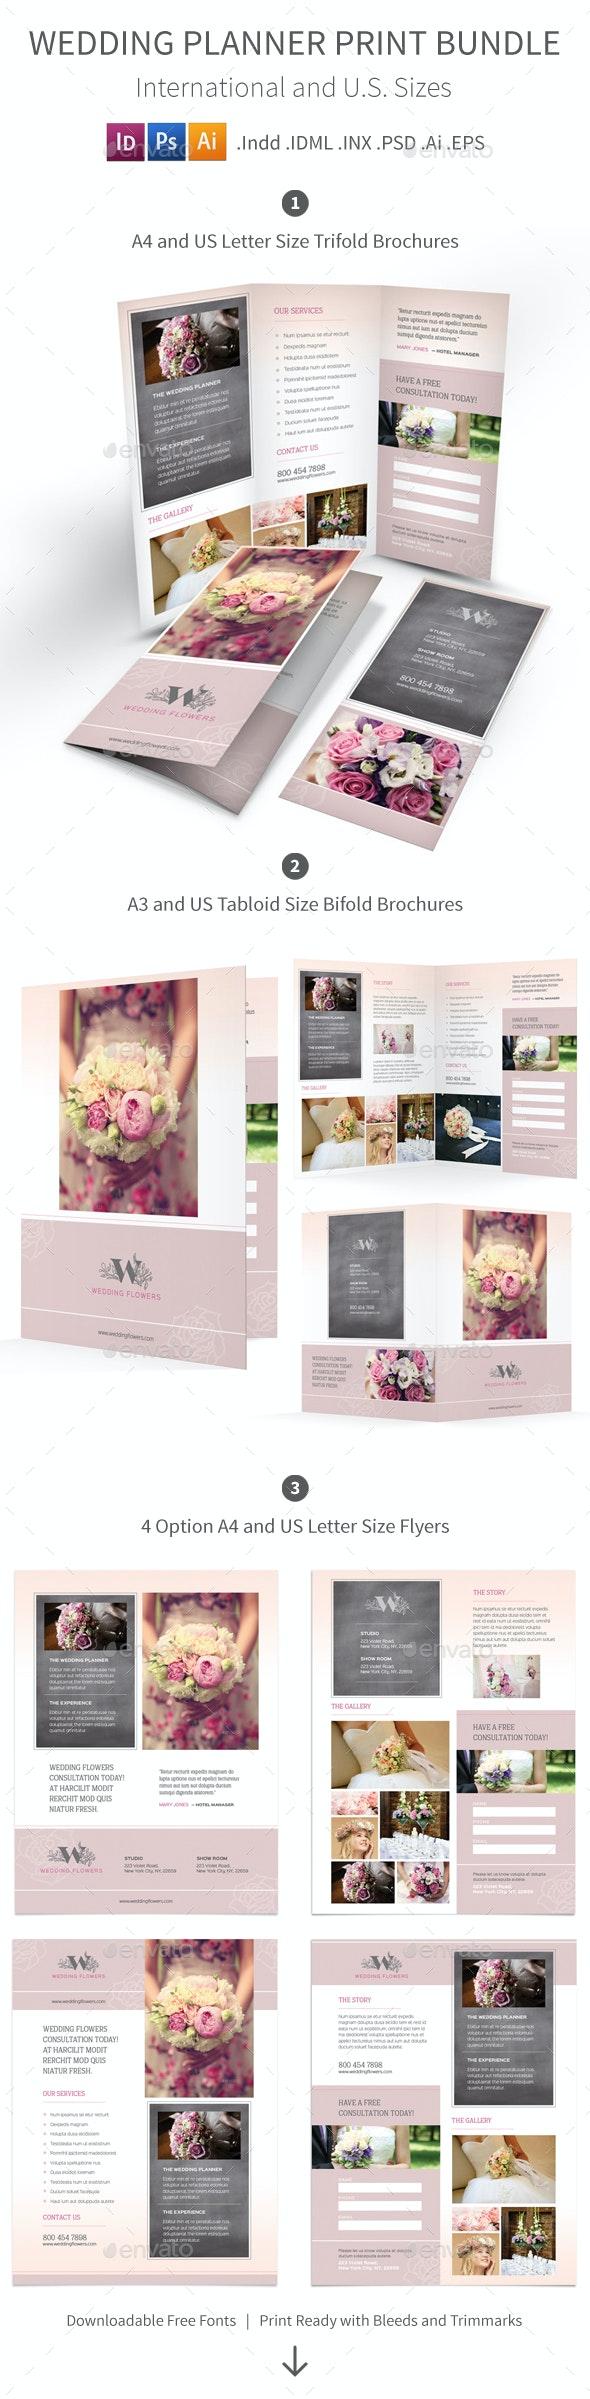 Wedding Planner Print Bundle - Informational Brochures